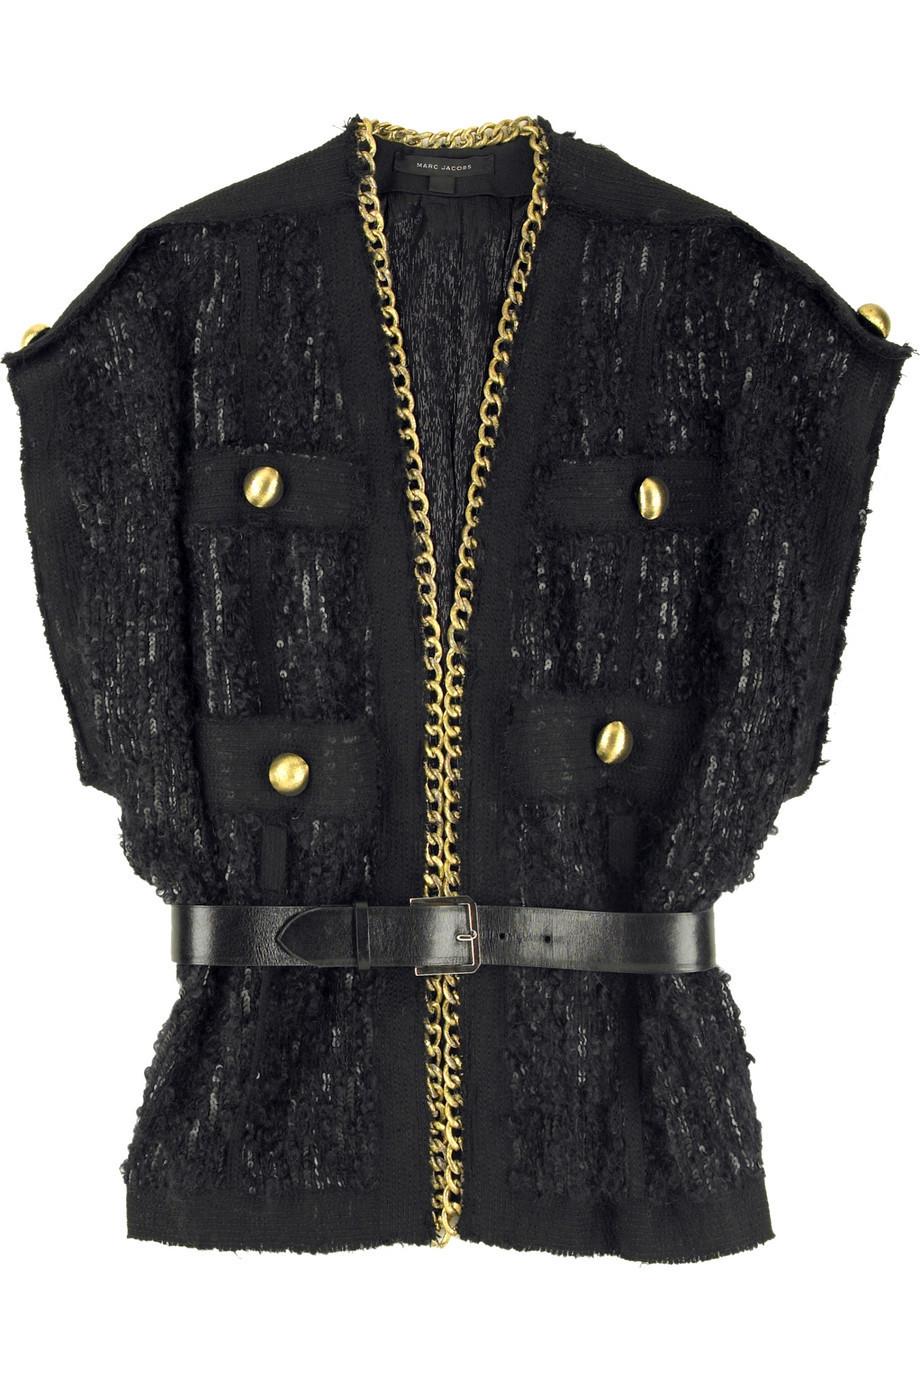 marc jacobs chain detail boucl jacket net a porter com. Black Bedroom Furniture Sets. Home Design Ideas